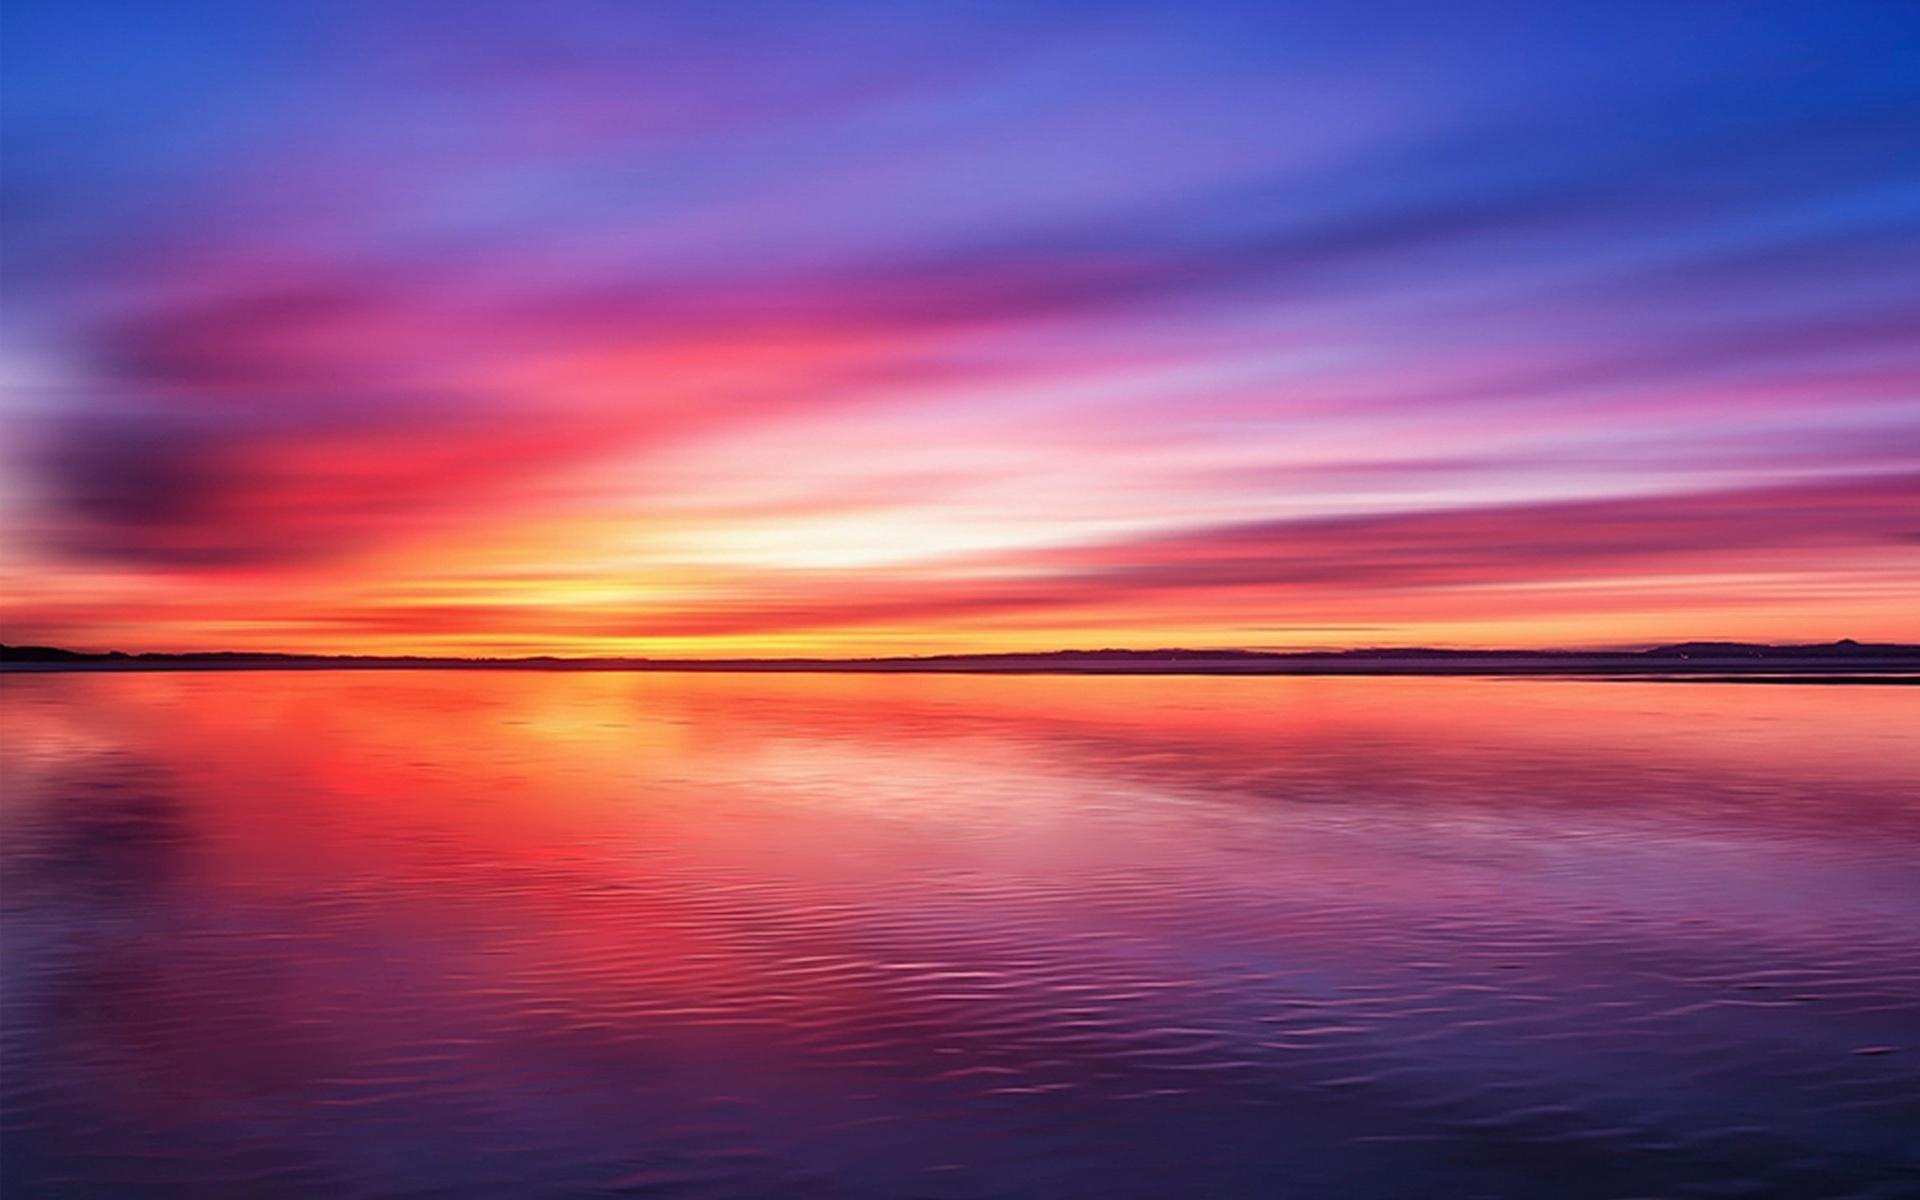 3d Rose Wallpaper Apps Amazing Pink Sunset At The Horizon Hd Desktop Wallpaper